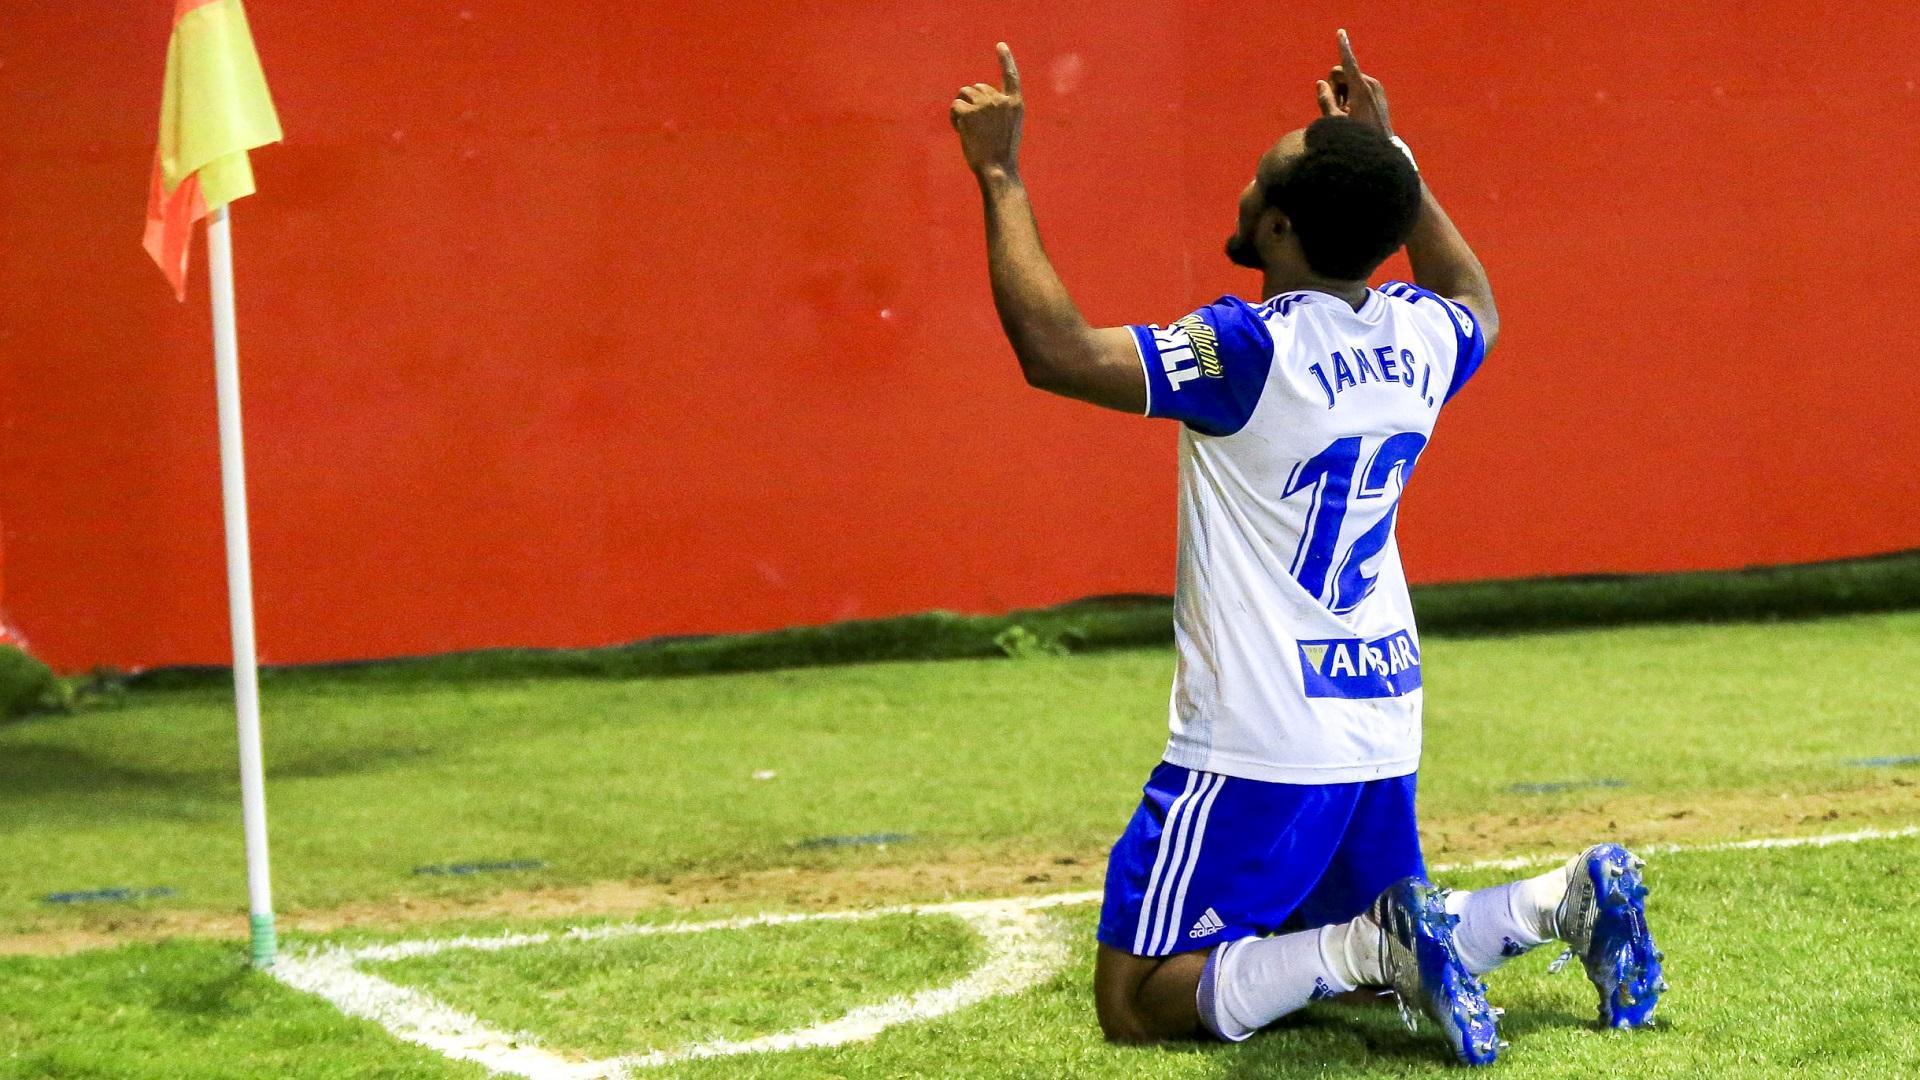 Igbekeme's Real Zaragoza down SD Ponferradina to seal play-offs berth